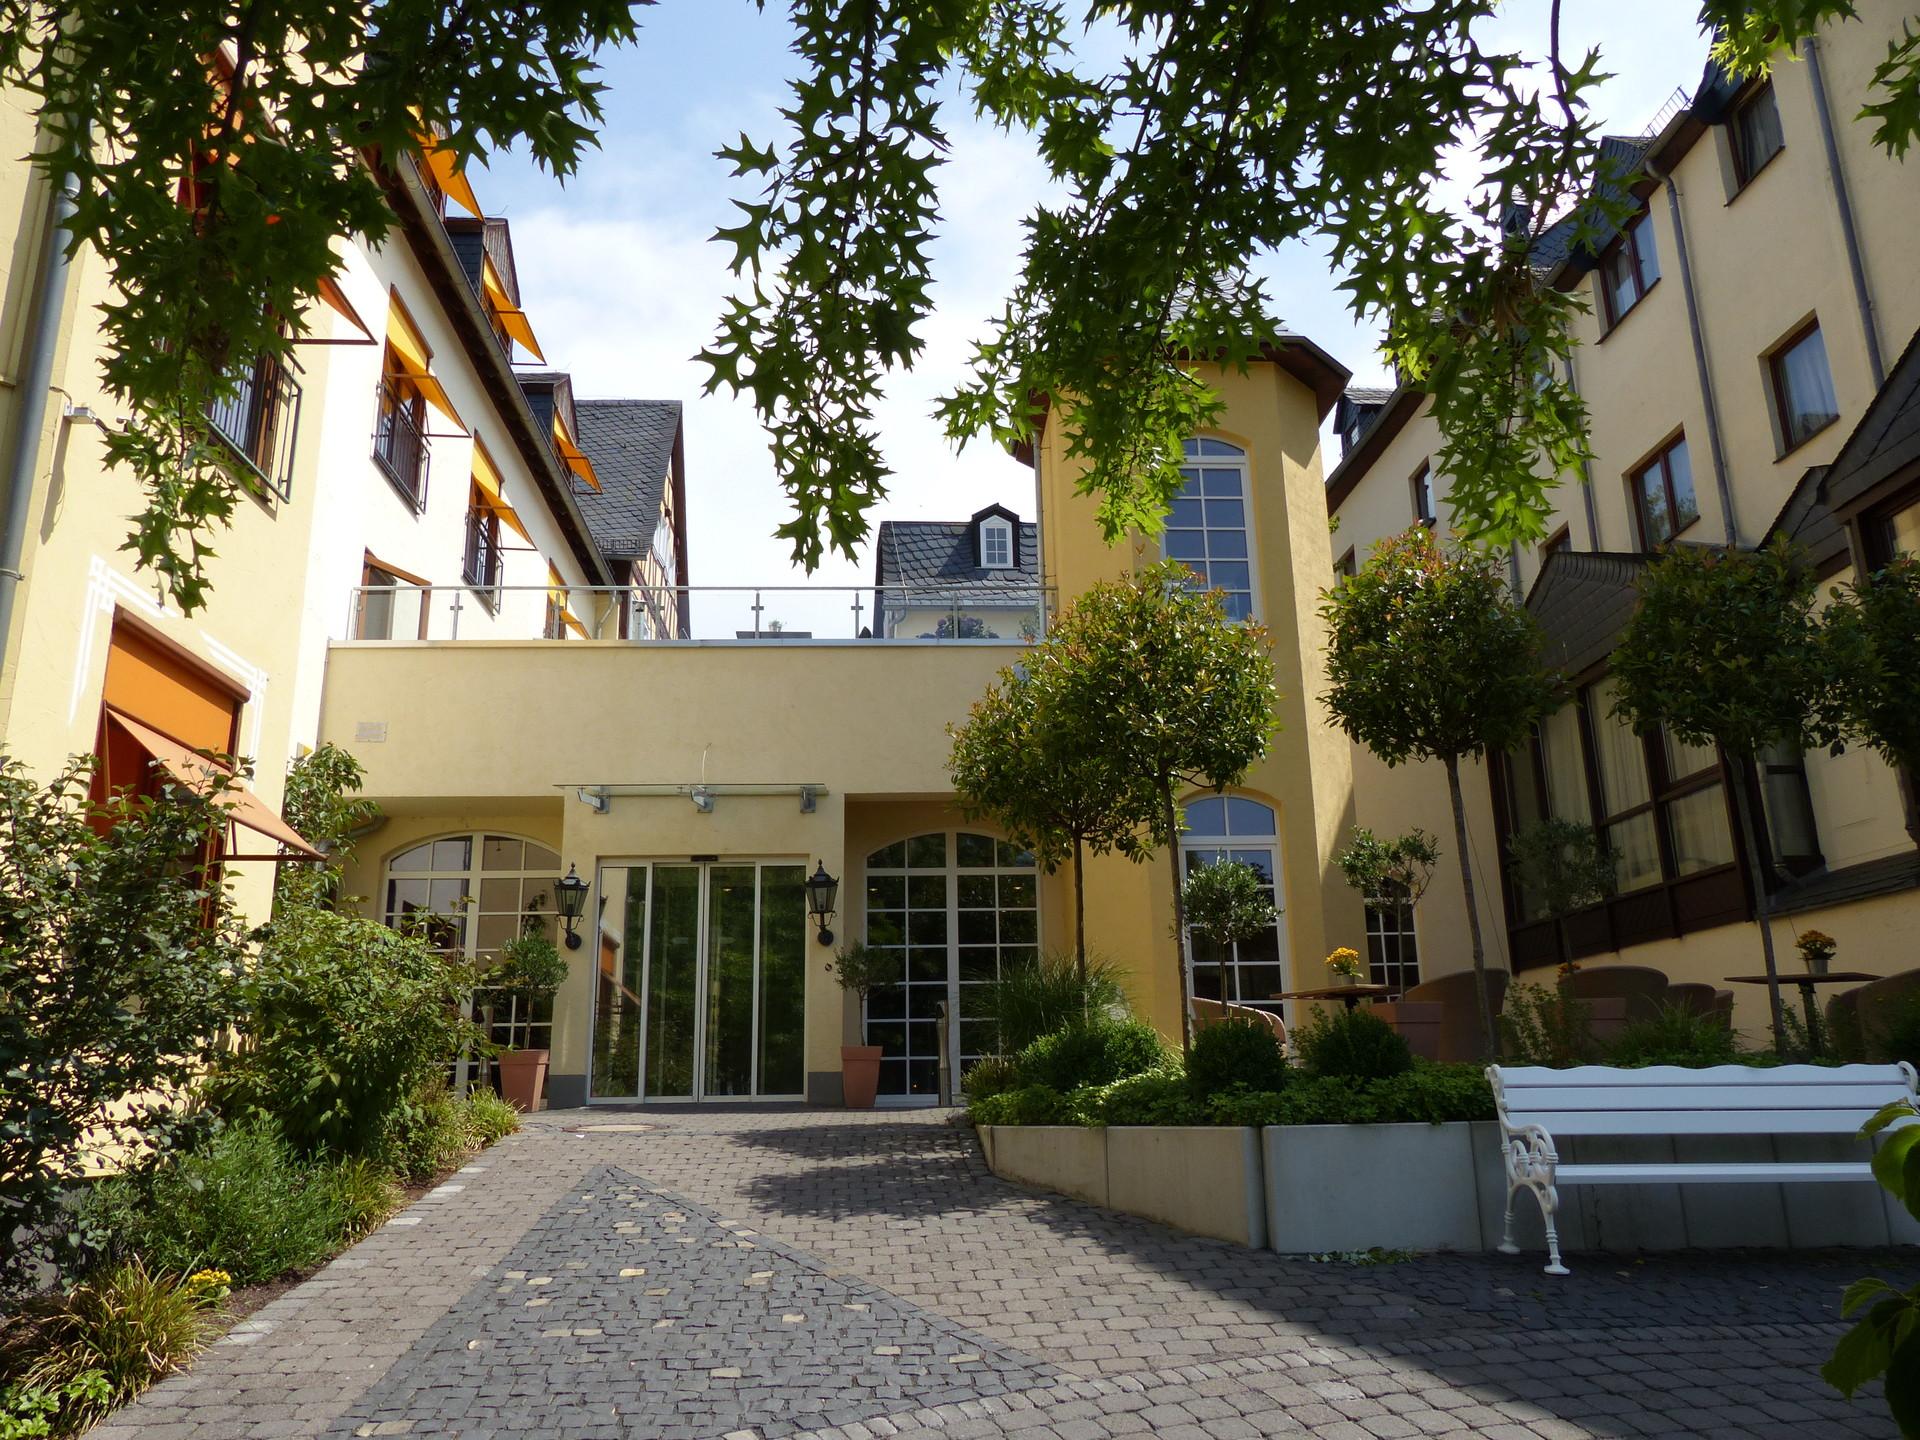 Hotel Westerwald Wellness